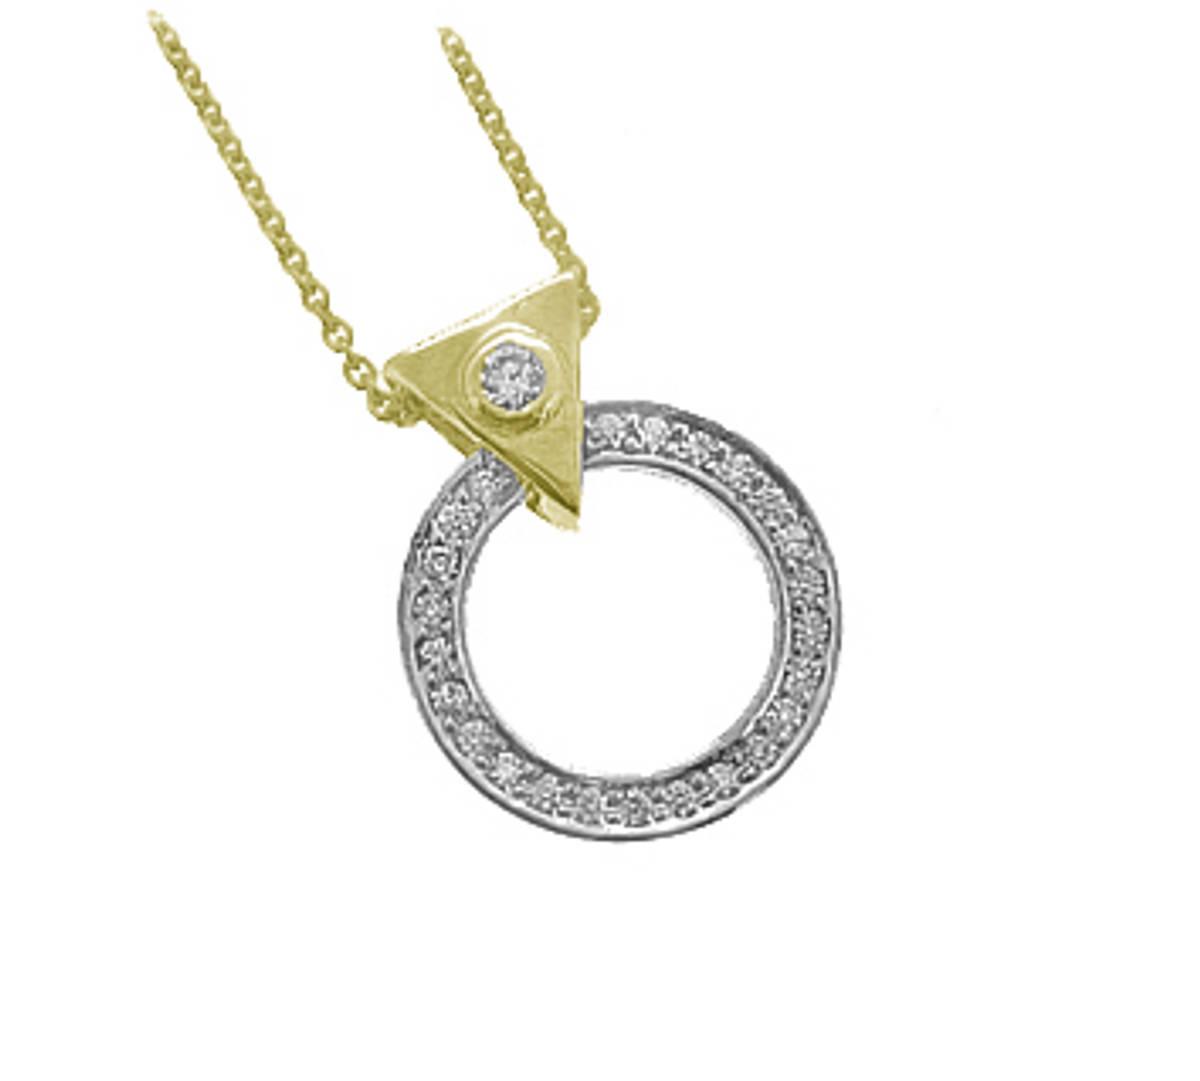 "9k Gold Brilliant Cut Diamond Pendant On 9k Gold 18"" Chain Total Diamond Weight 0.30cts"